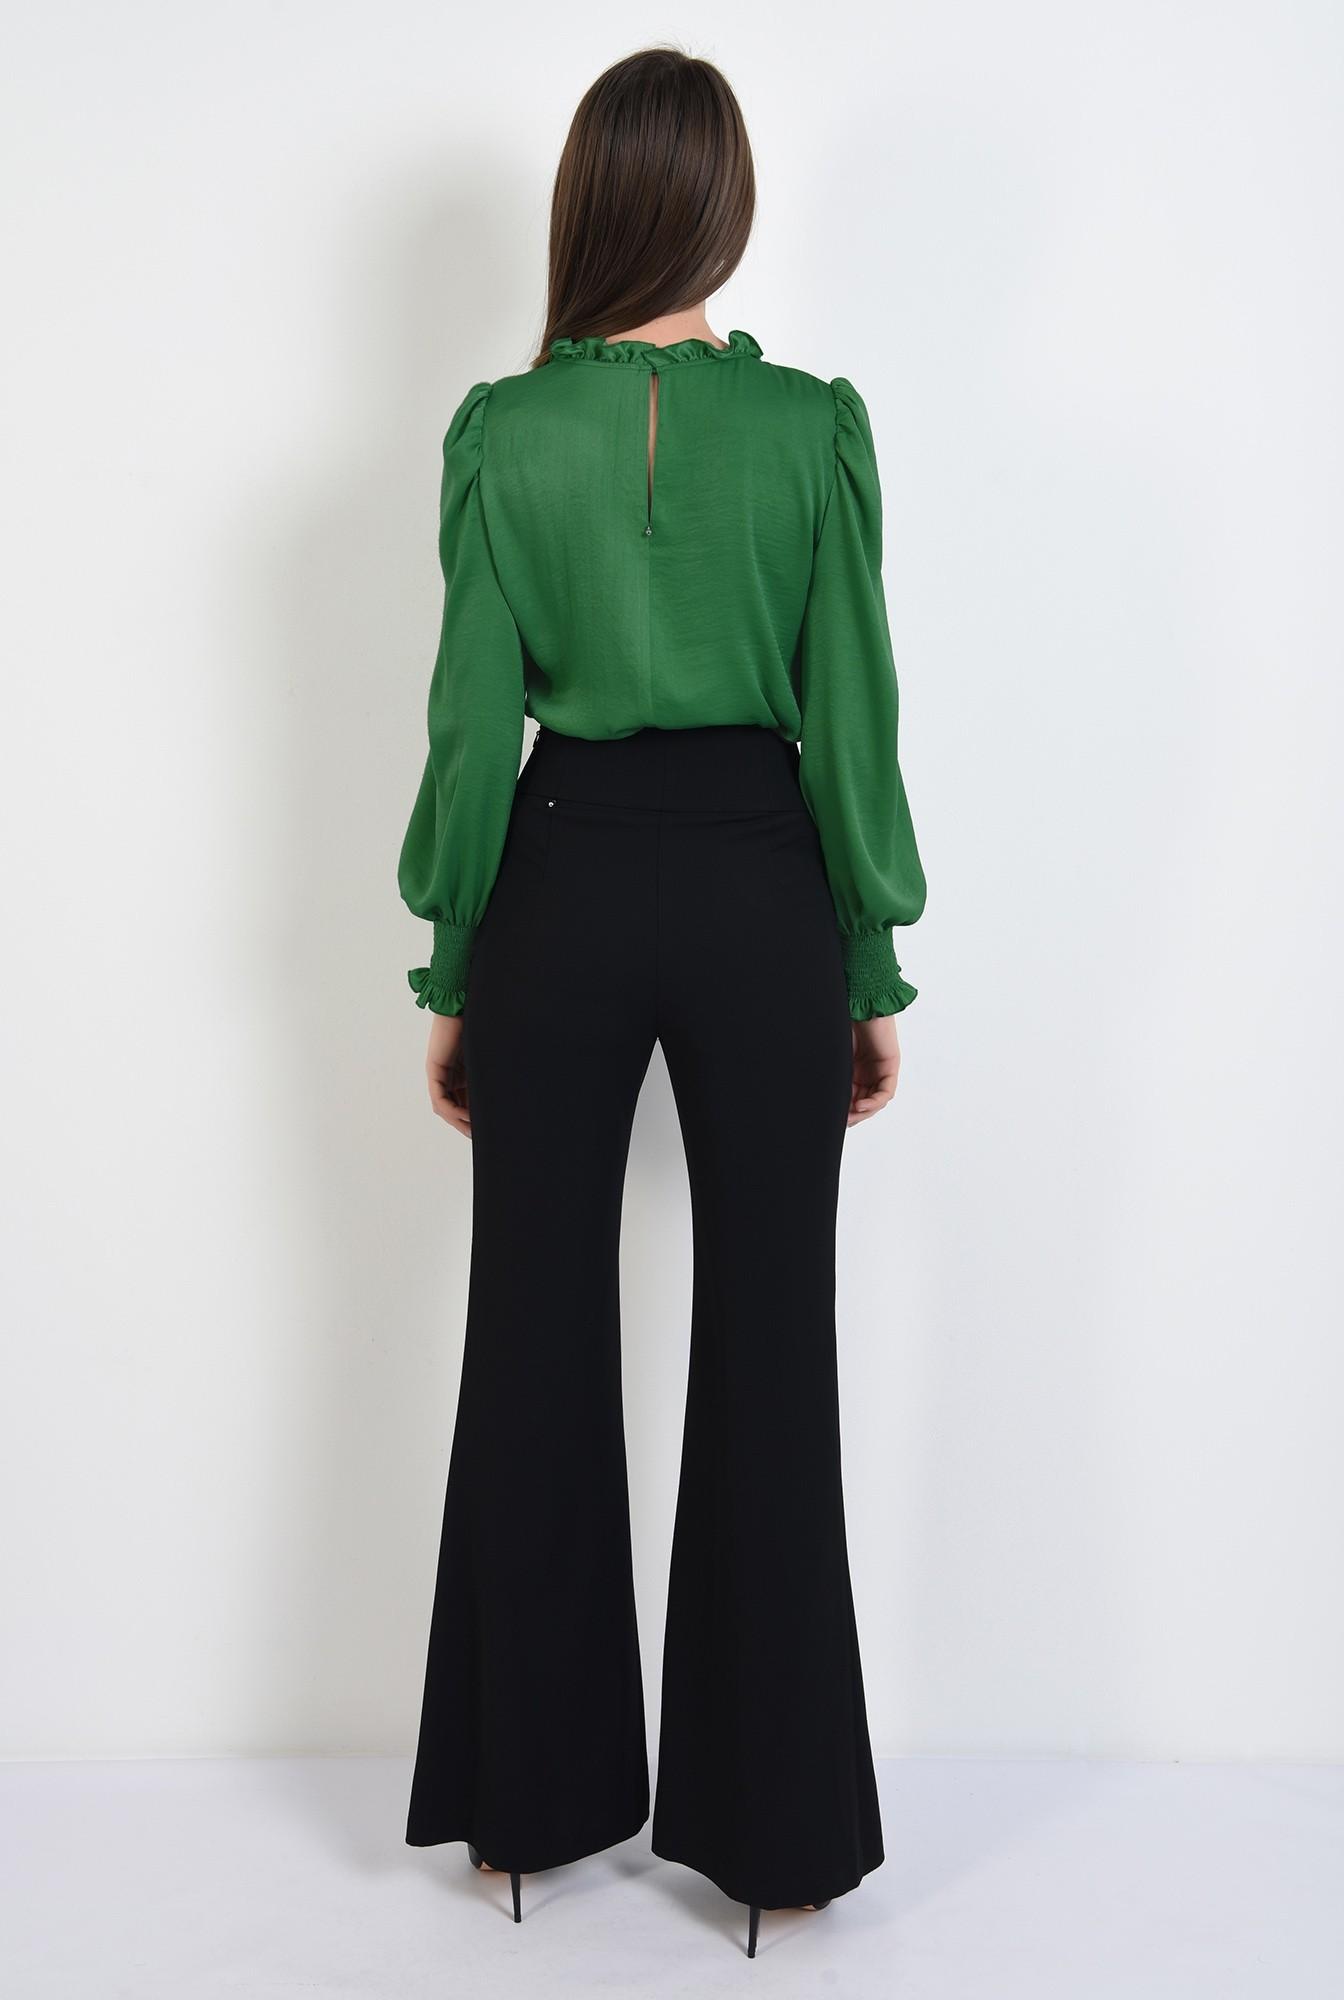 1 - bluza verde, din satin, guler incretit, maneci lungi, butoniera